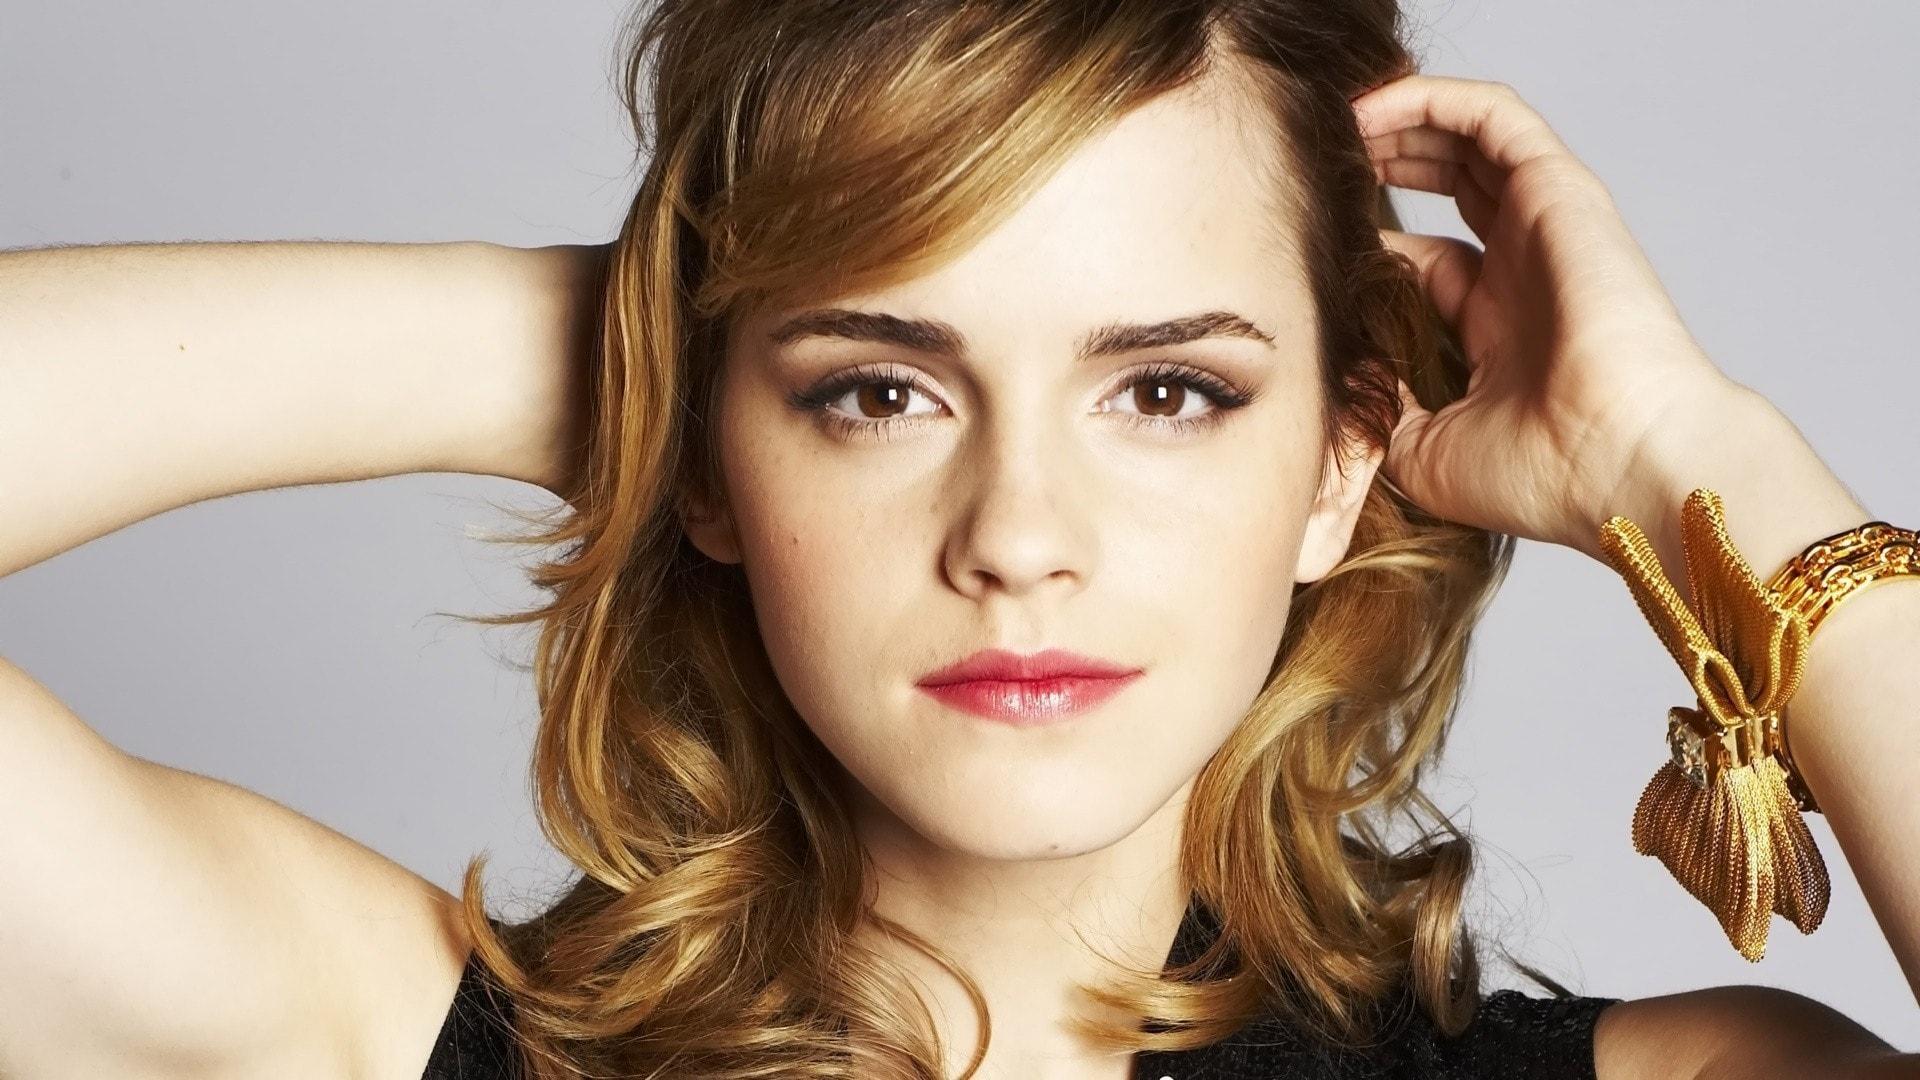 Emma Watson for mobile